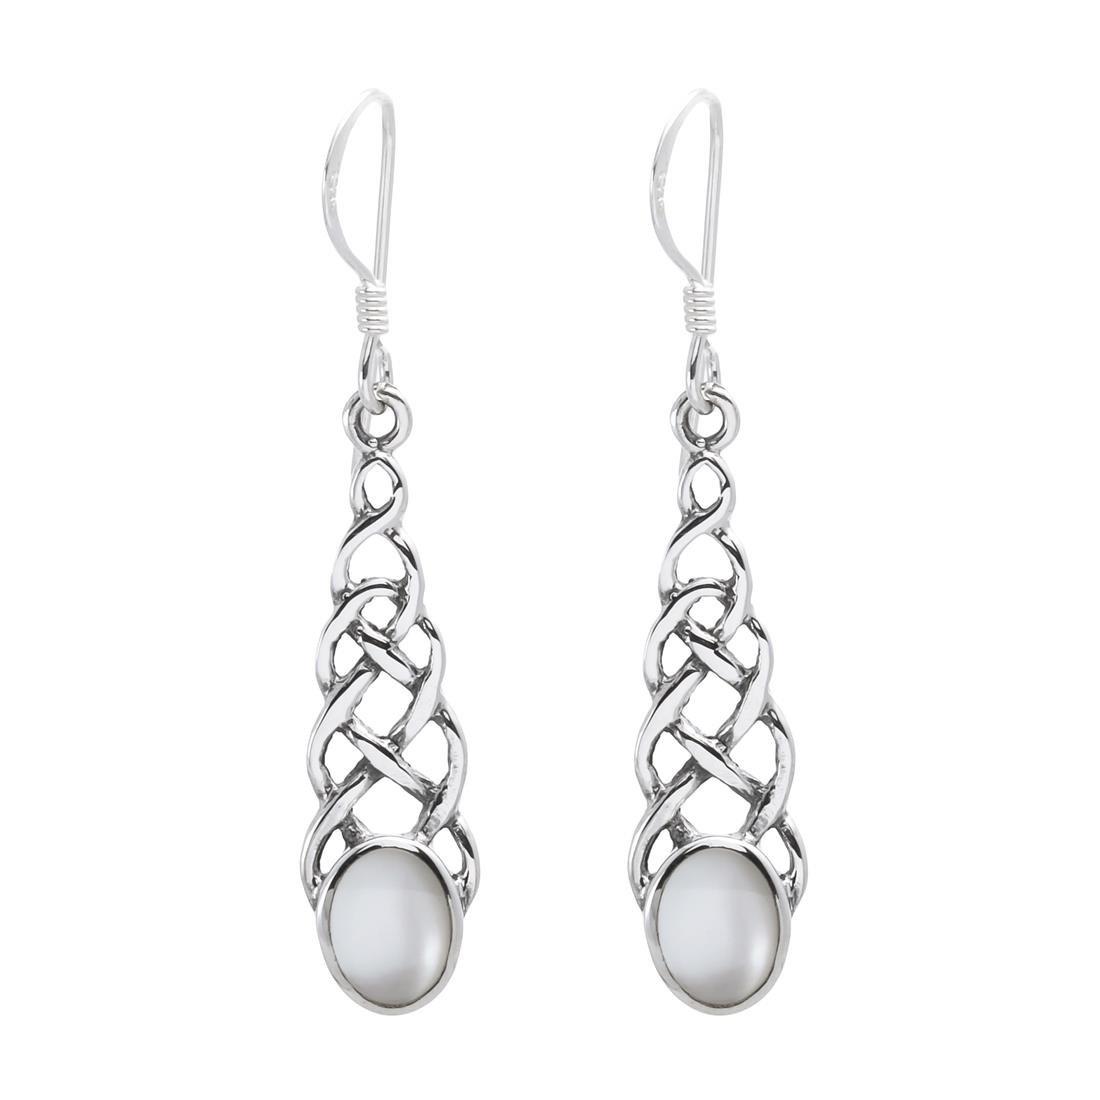 Silverly Women's .925 Sterling Silver Celtic Knot Mother of Pearl Dangle Earrings 01iiSSE129